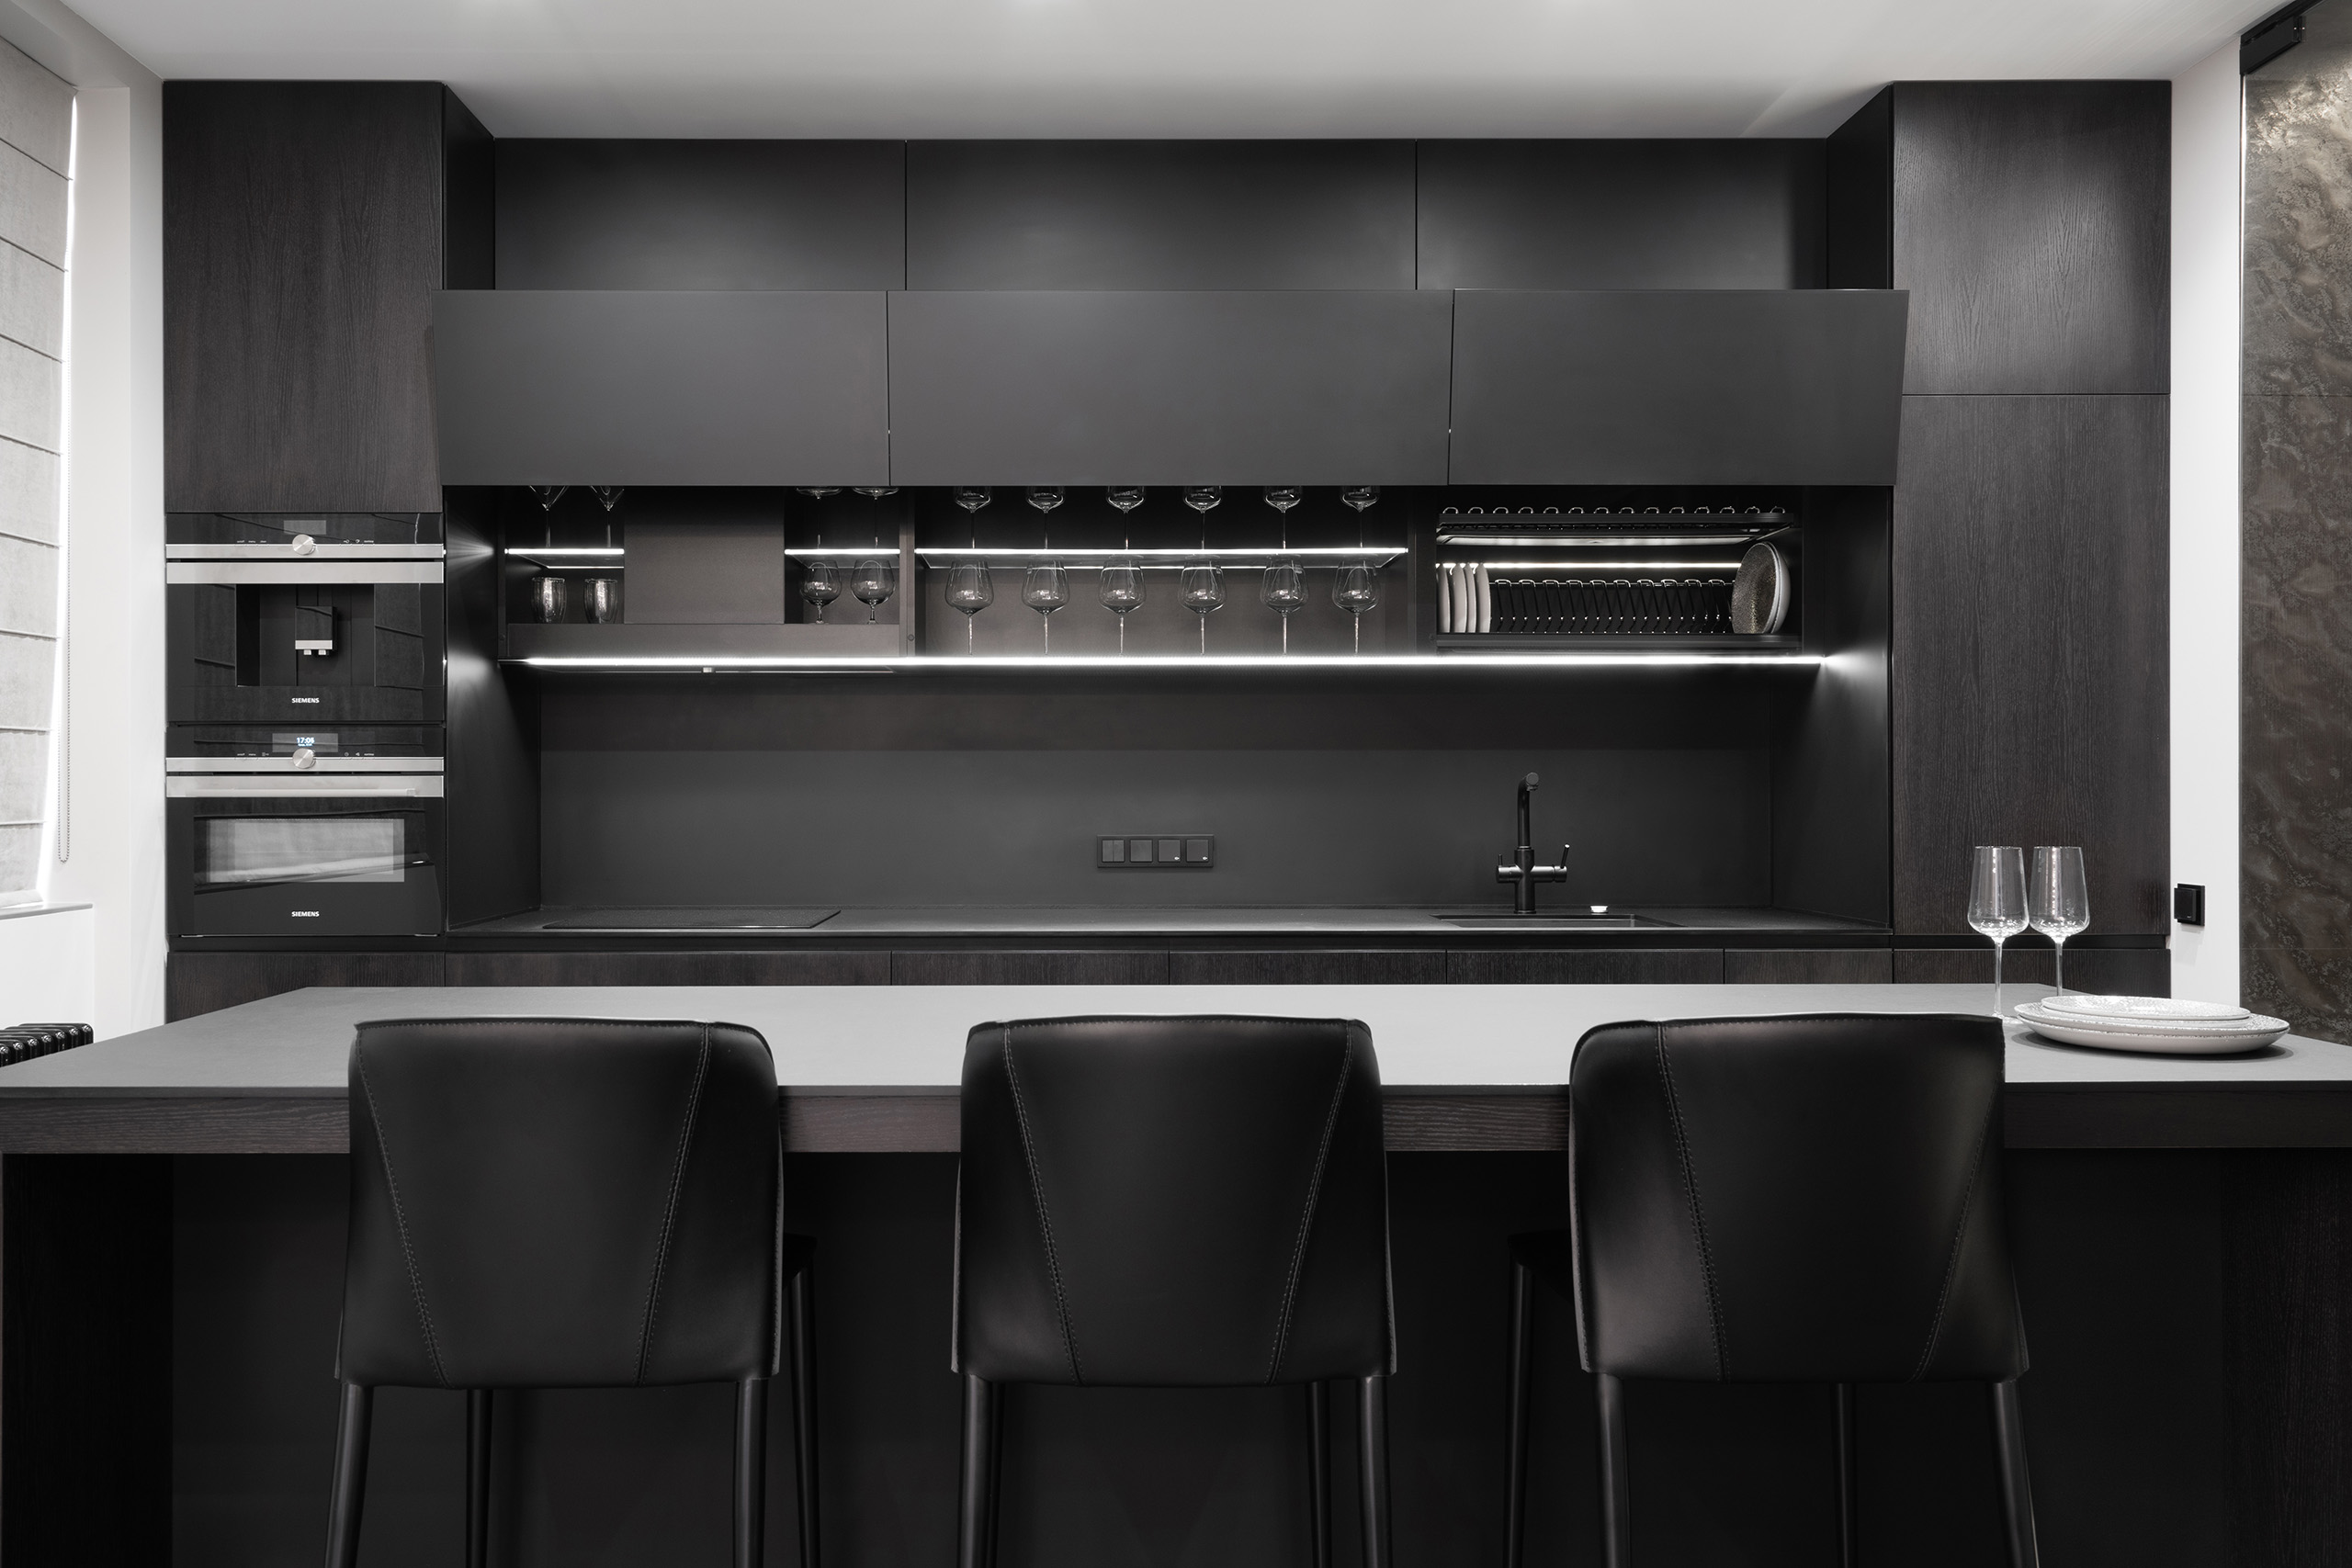 Фотосъемка интерьера кухни в квартире